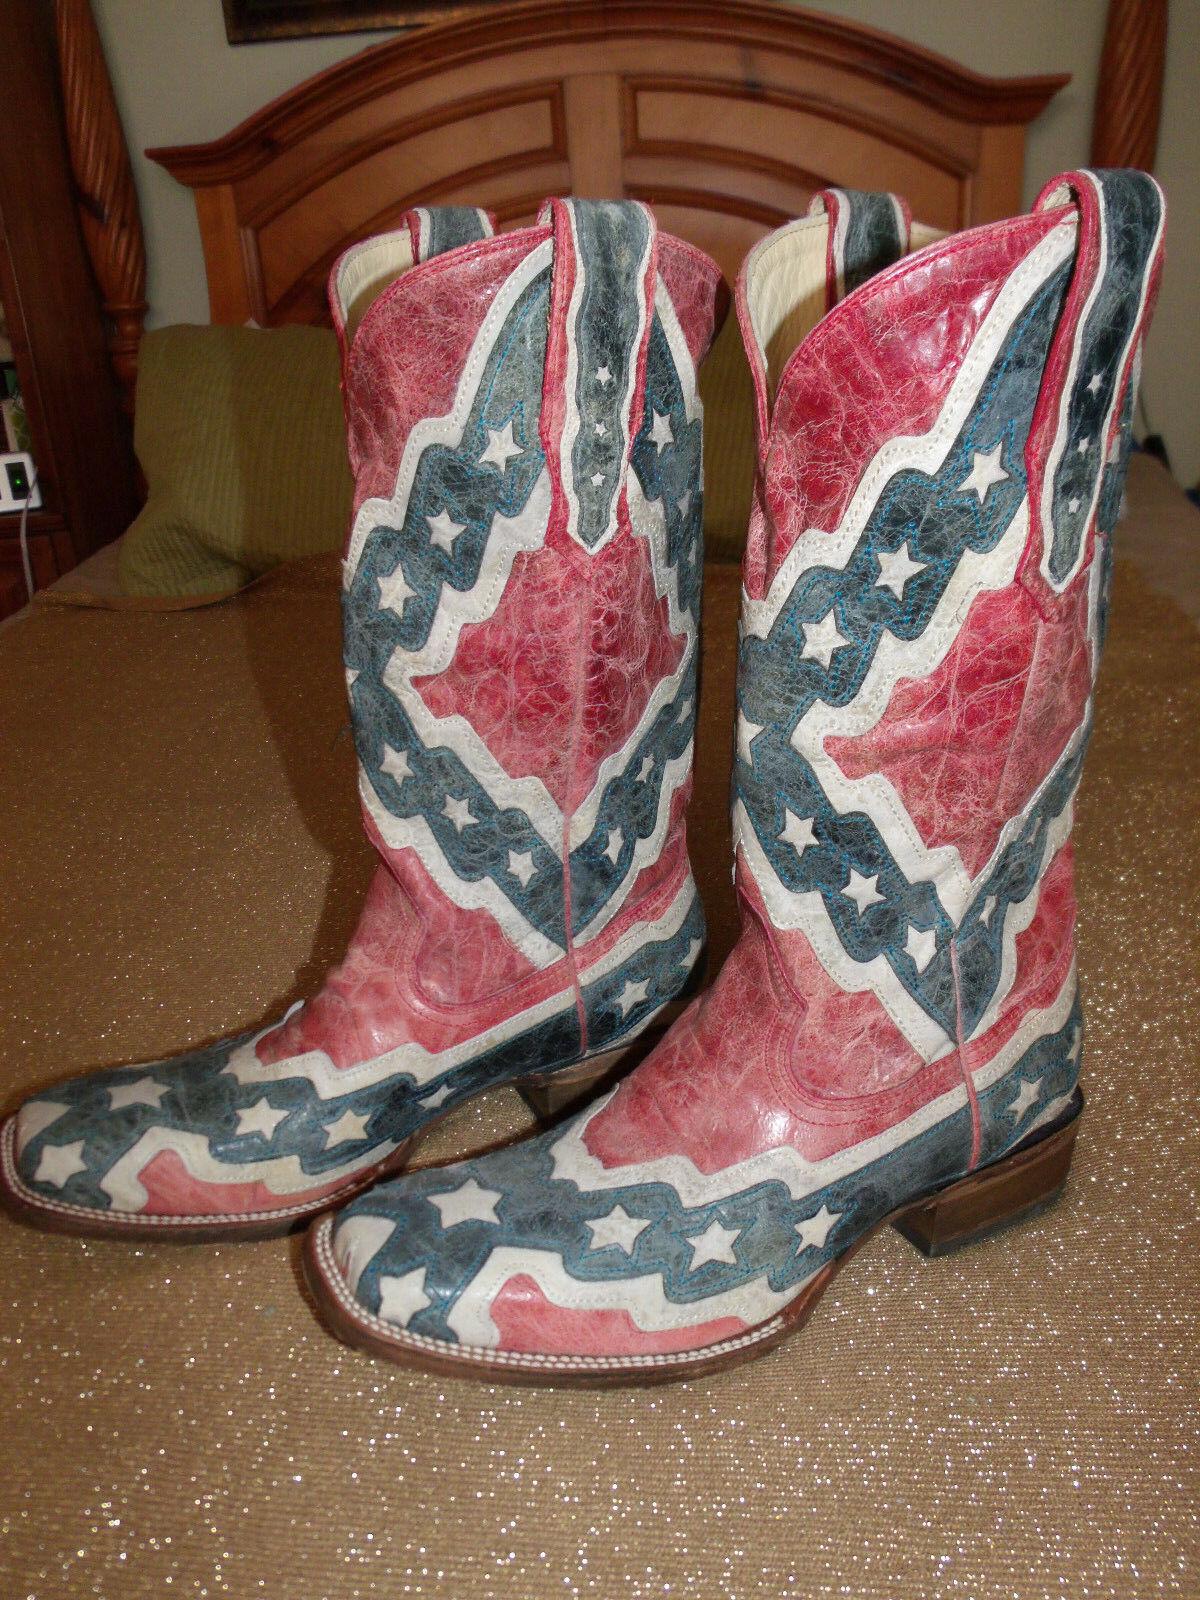 Corral Men's rot Weiß Weiß Weiß & Blau Flag A1324 Square Toe Leather Western Stiefel 10.0EE 1c40e2